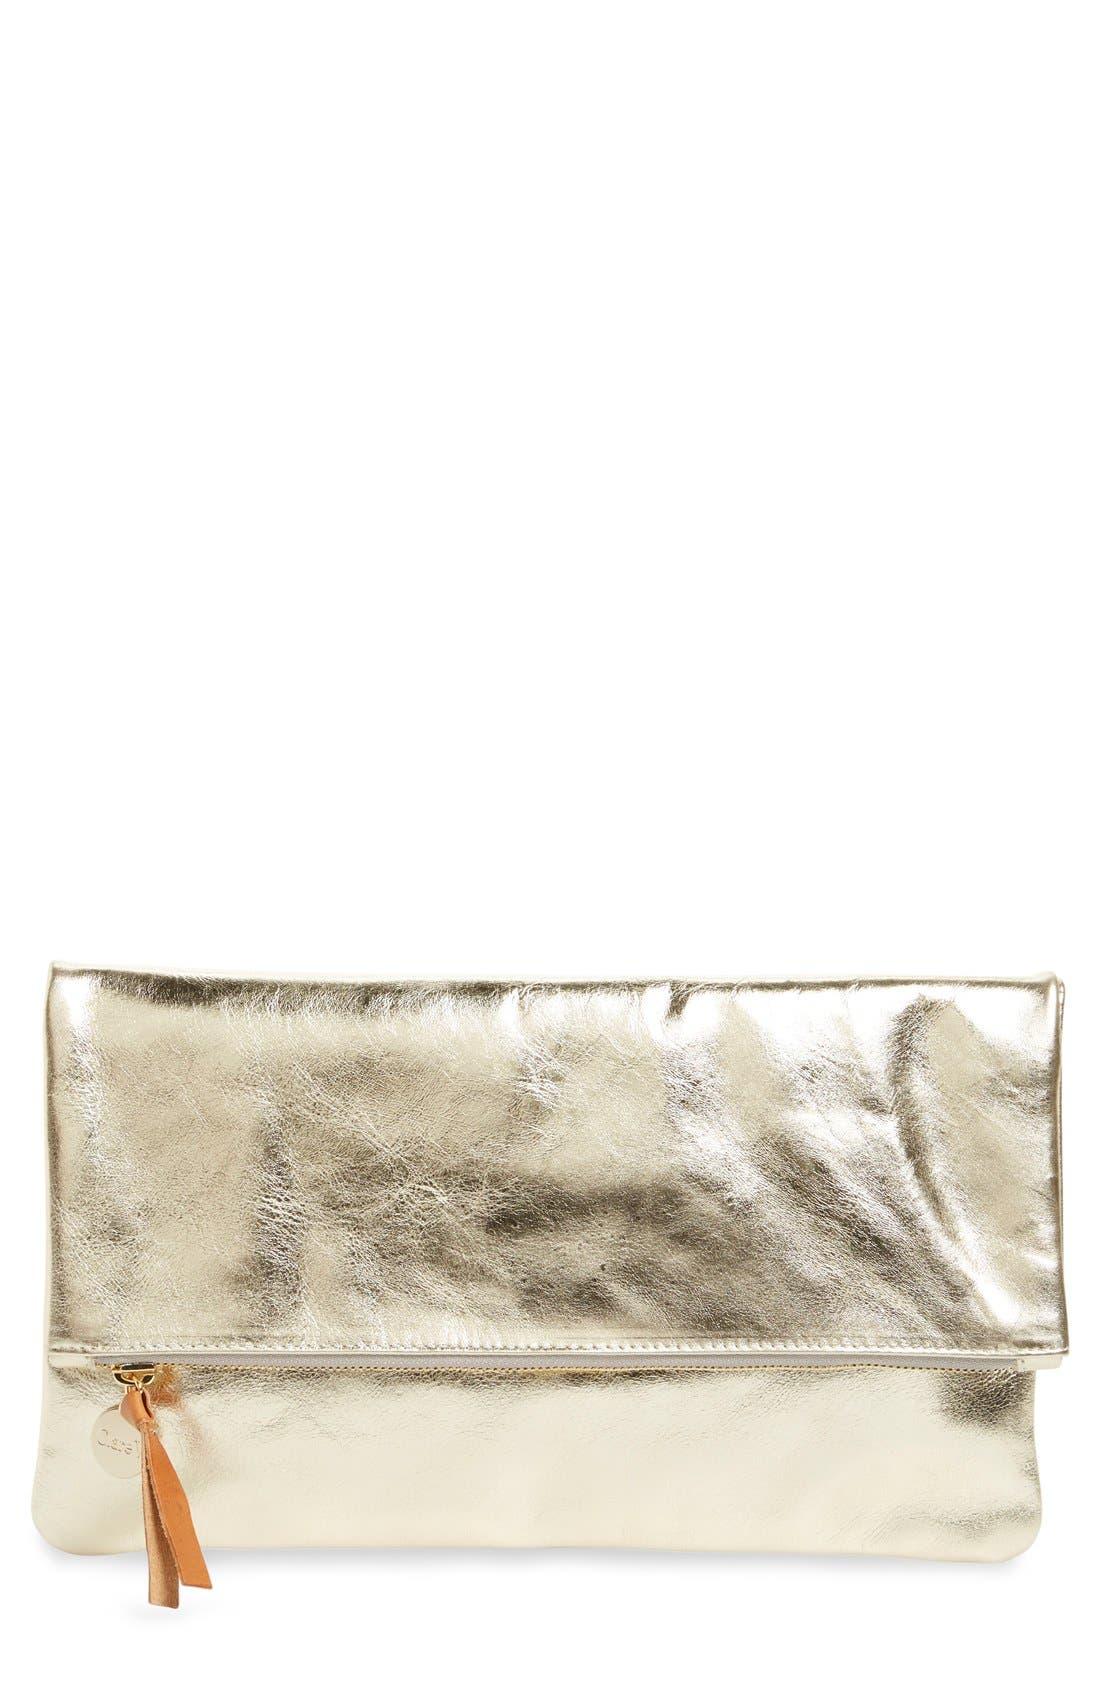 'Maison' Metallic Leather Foldover Clutch,                             Main thumbnail 1, color,                             710